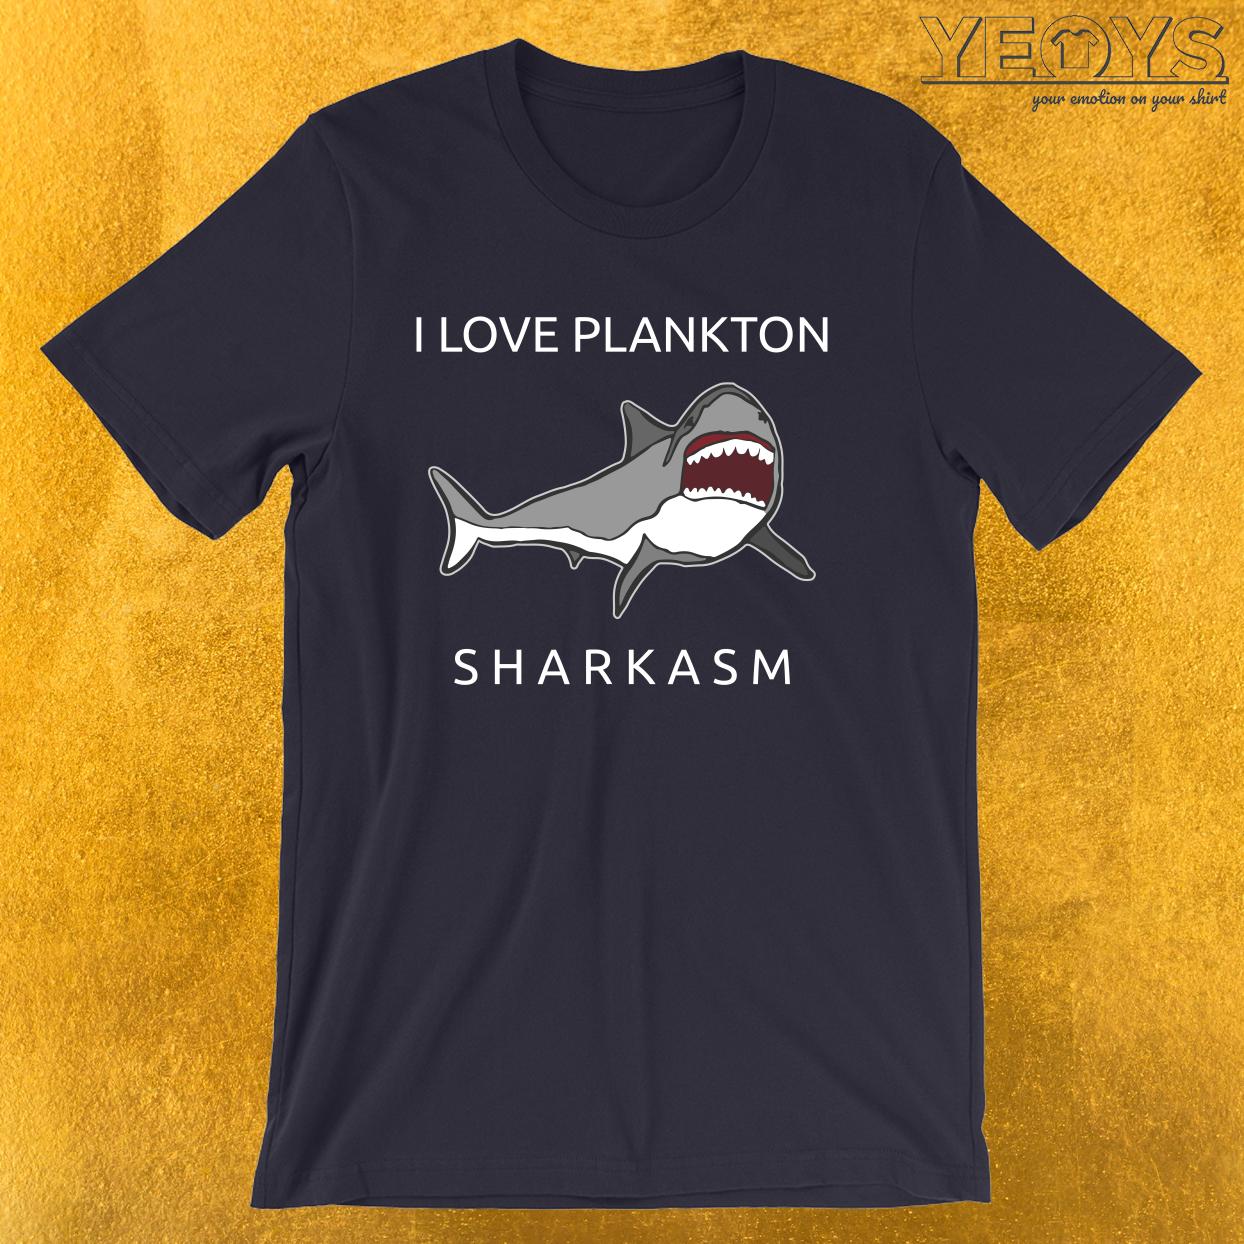 Funny Shark Pun – I Love Plankton Sharkasm Tee